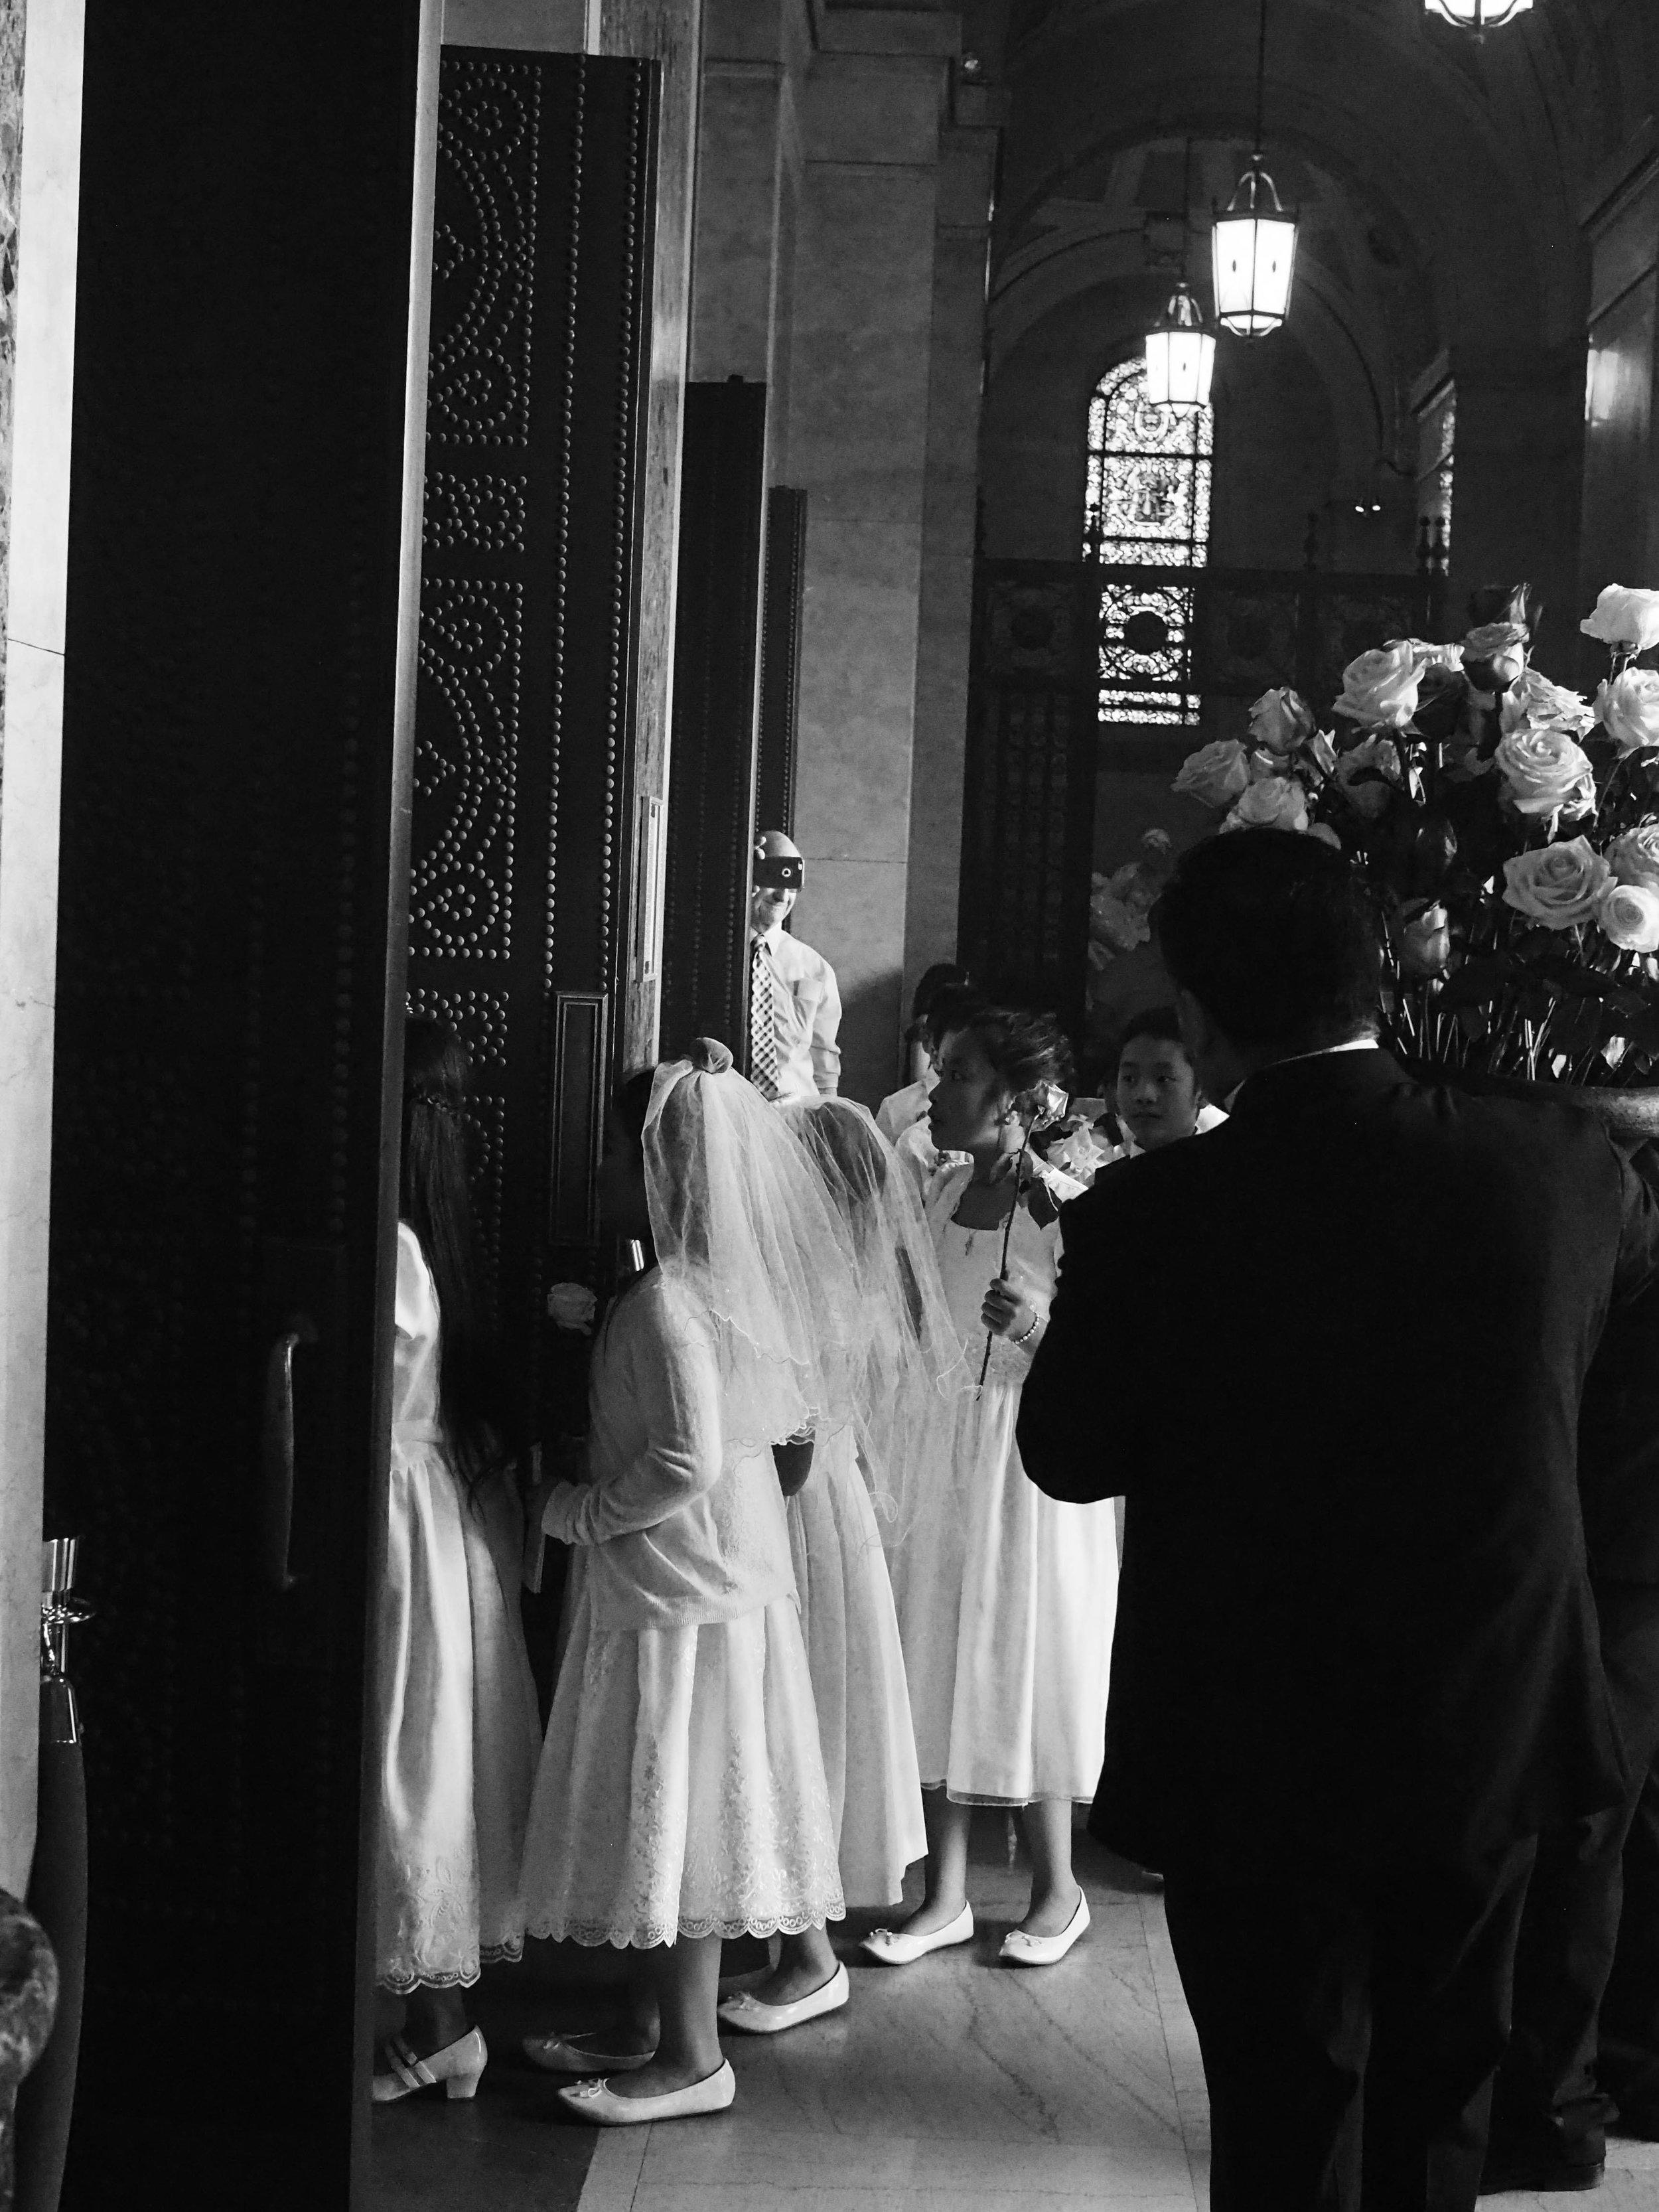 Rosary Procession. Saint Paul, MN.